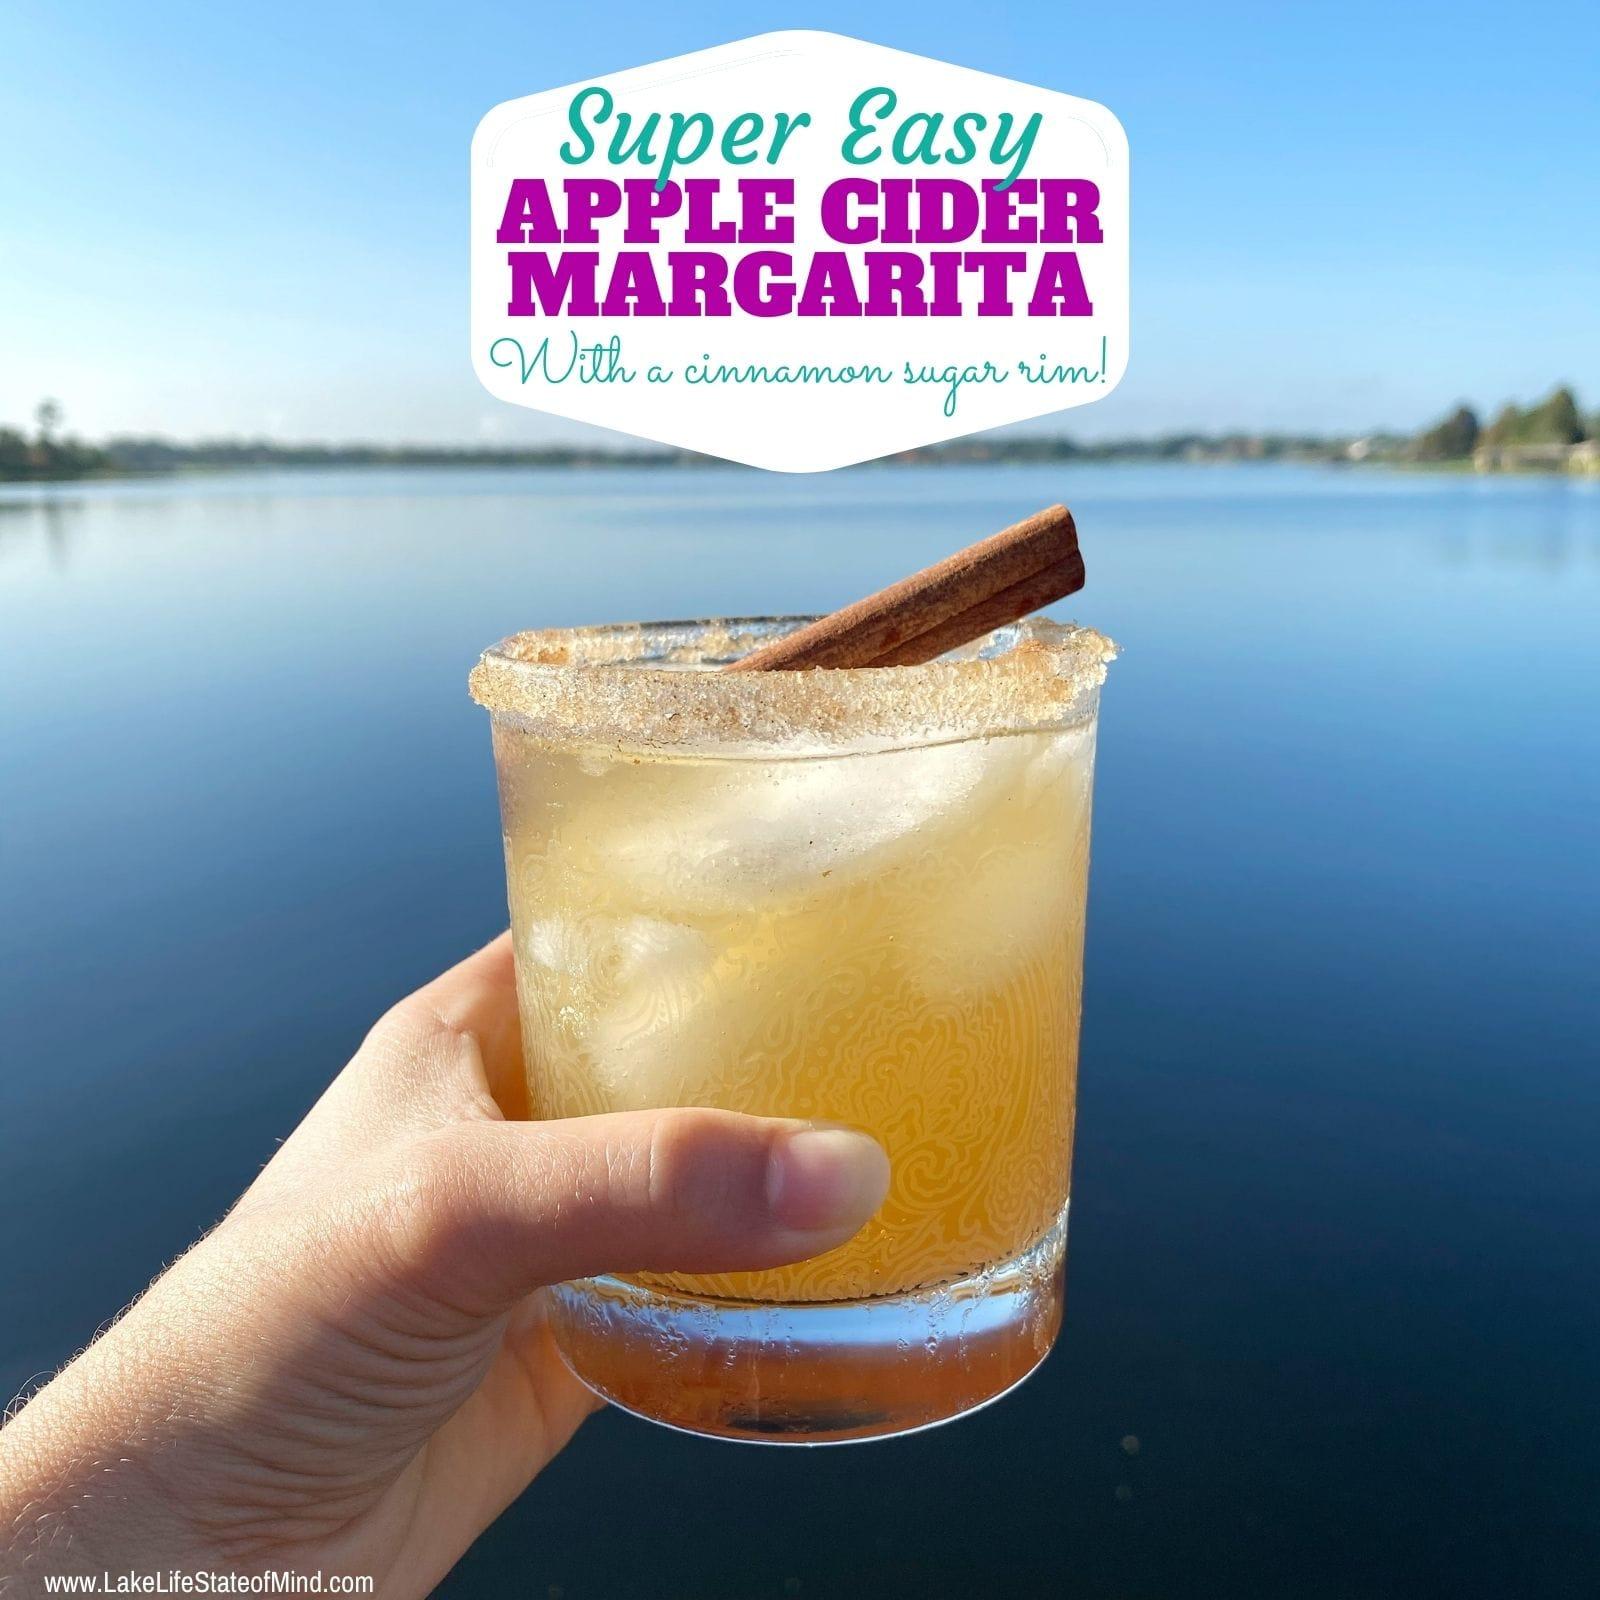 Easy Apple Cider Margarita